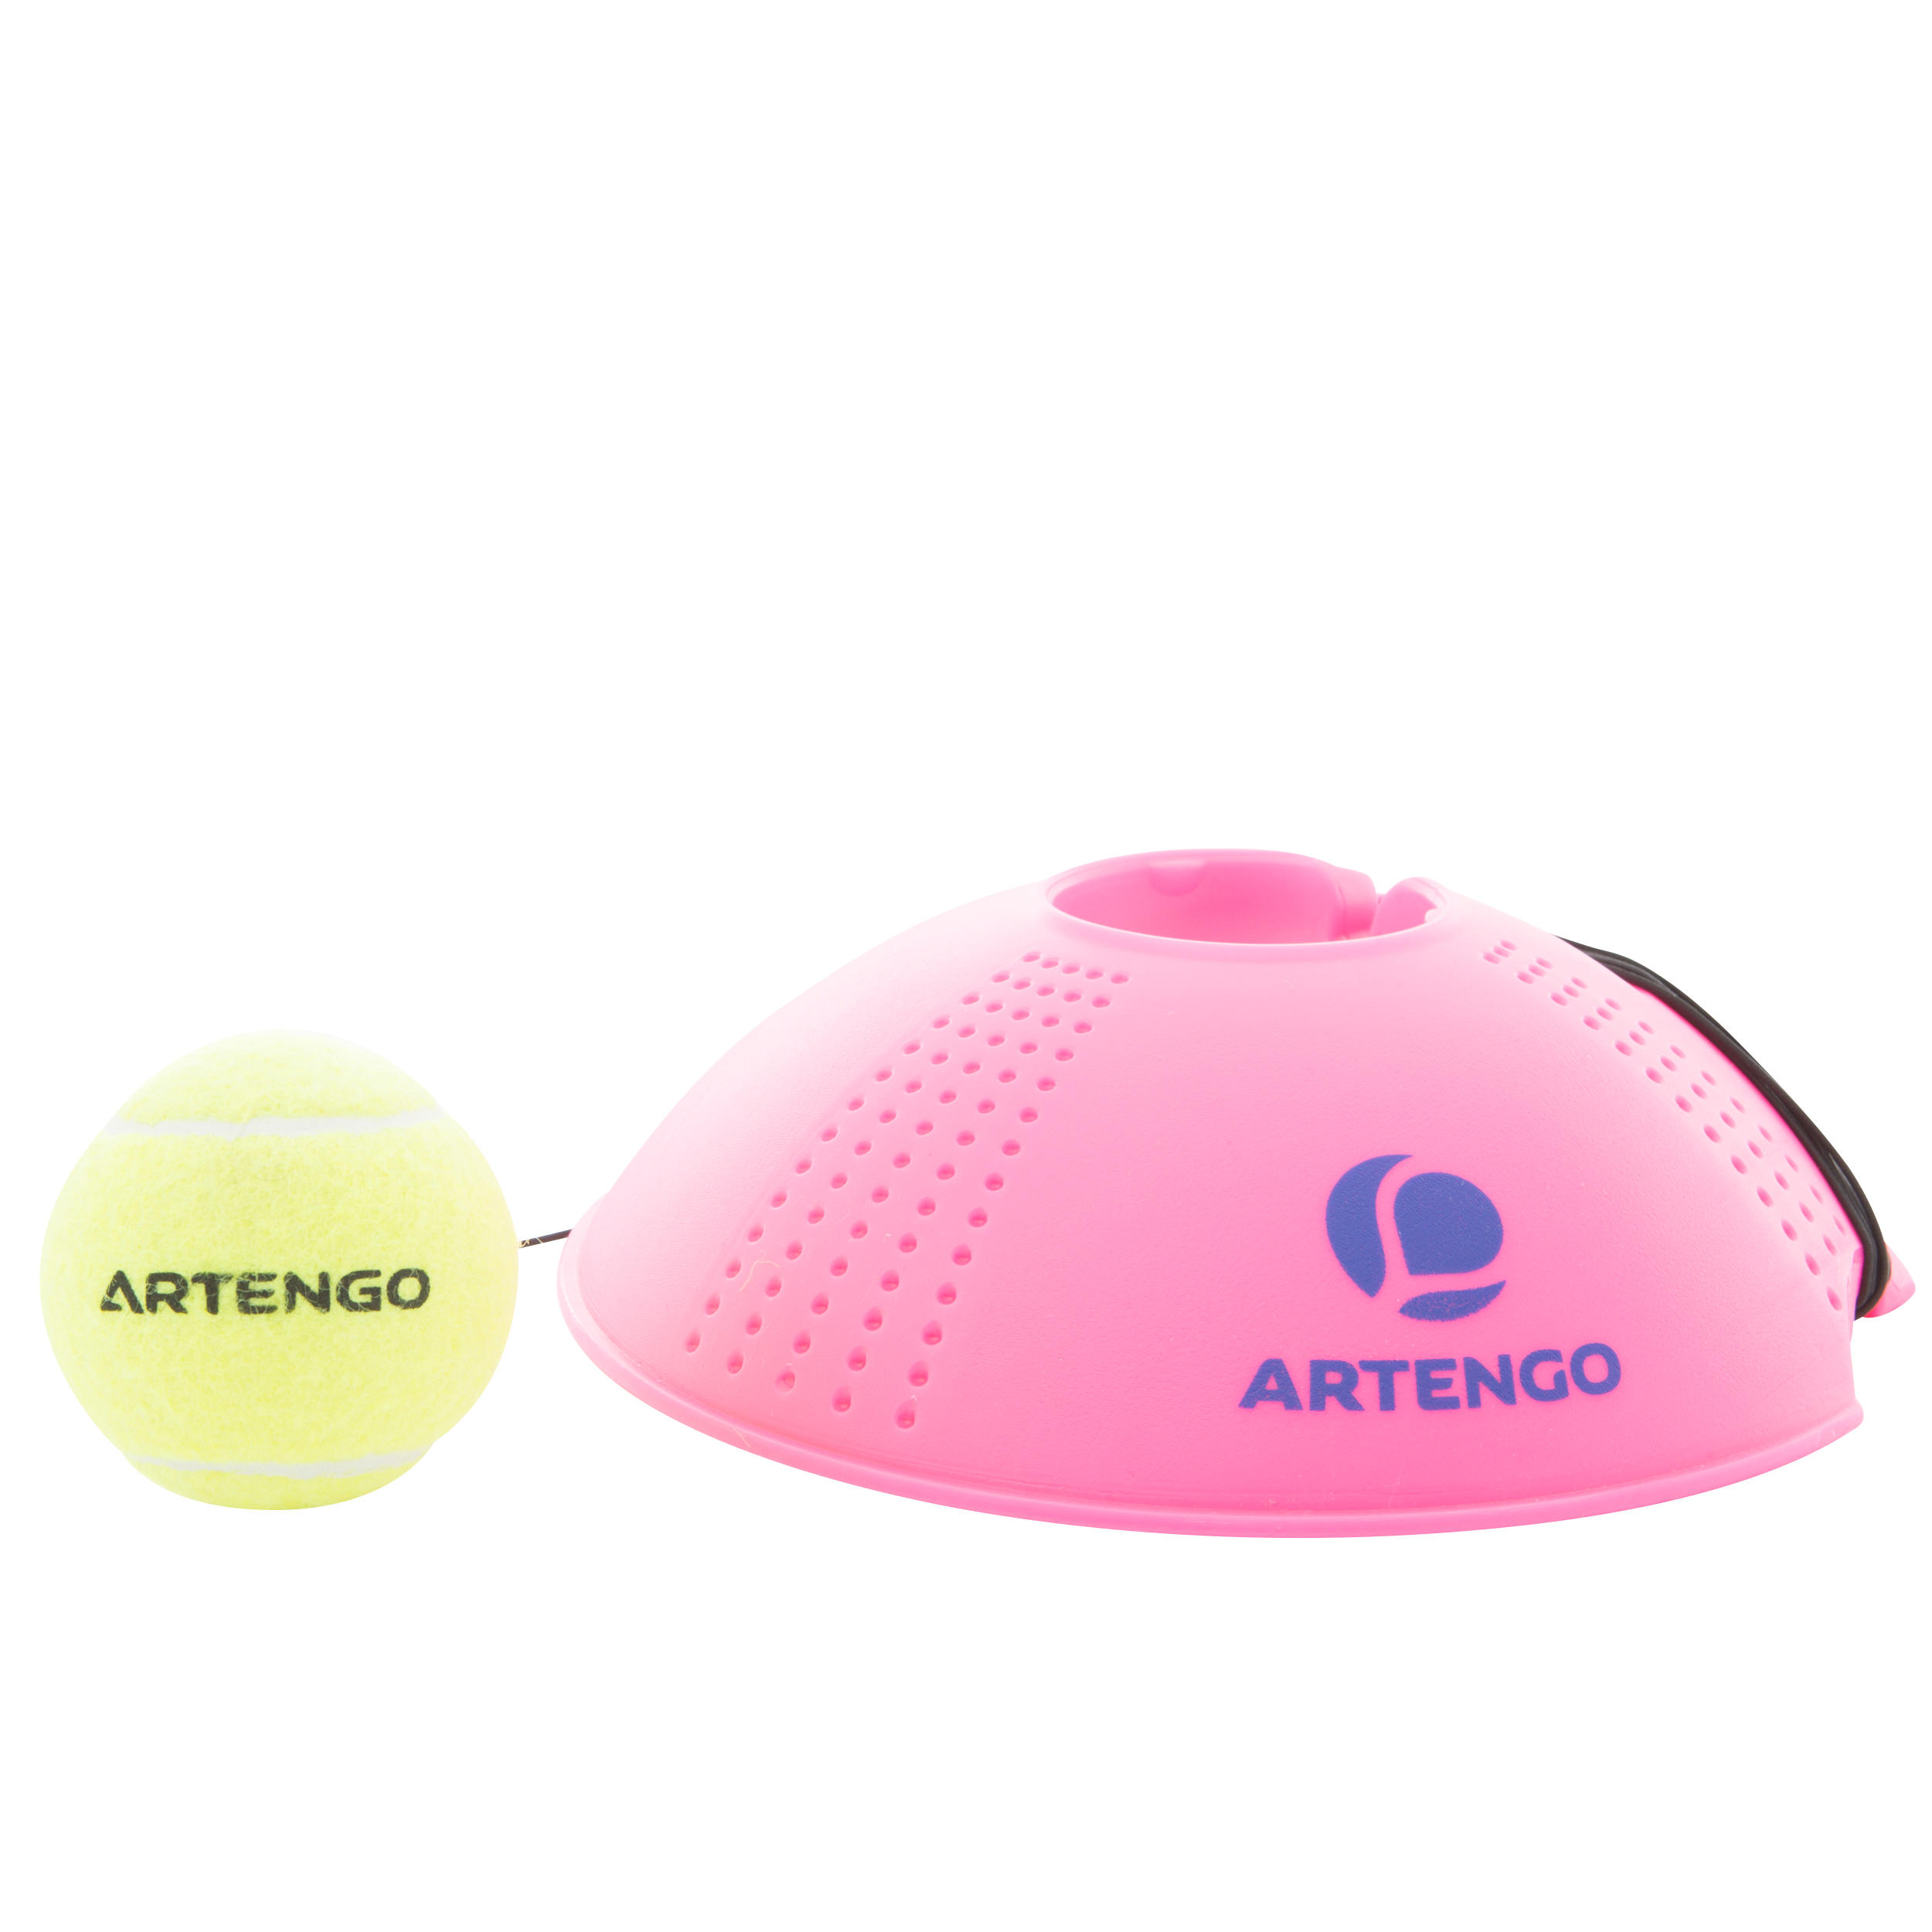 Artengo Tennistrainer Ball is back